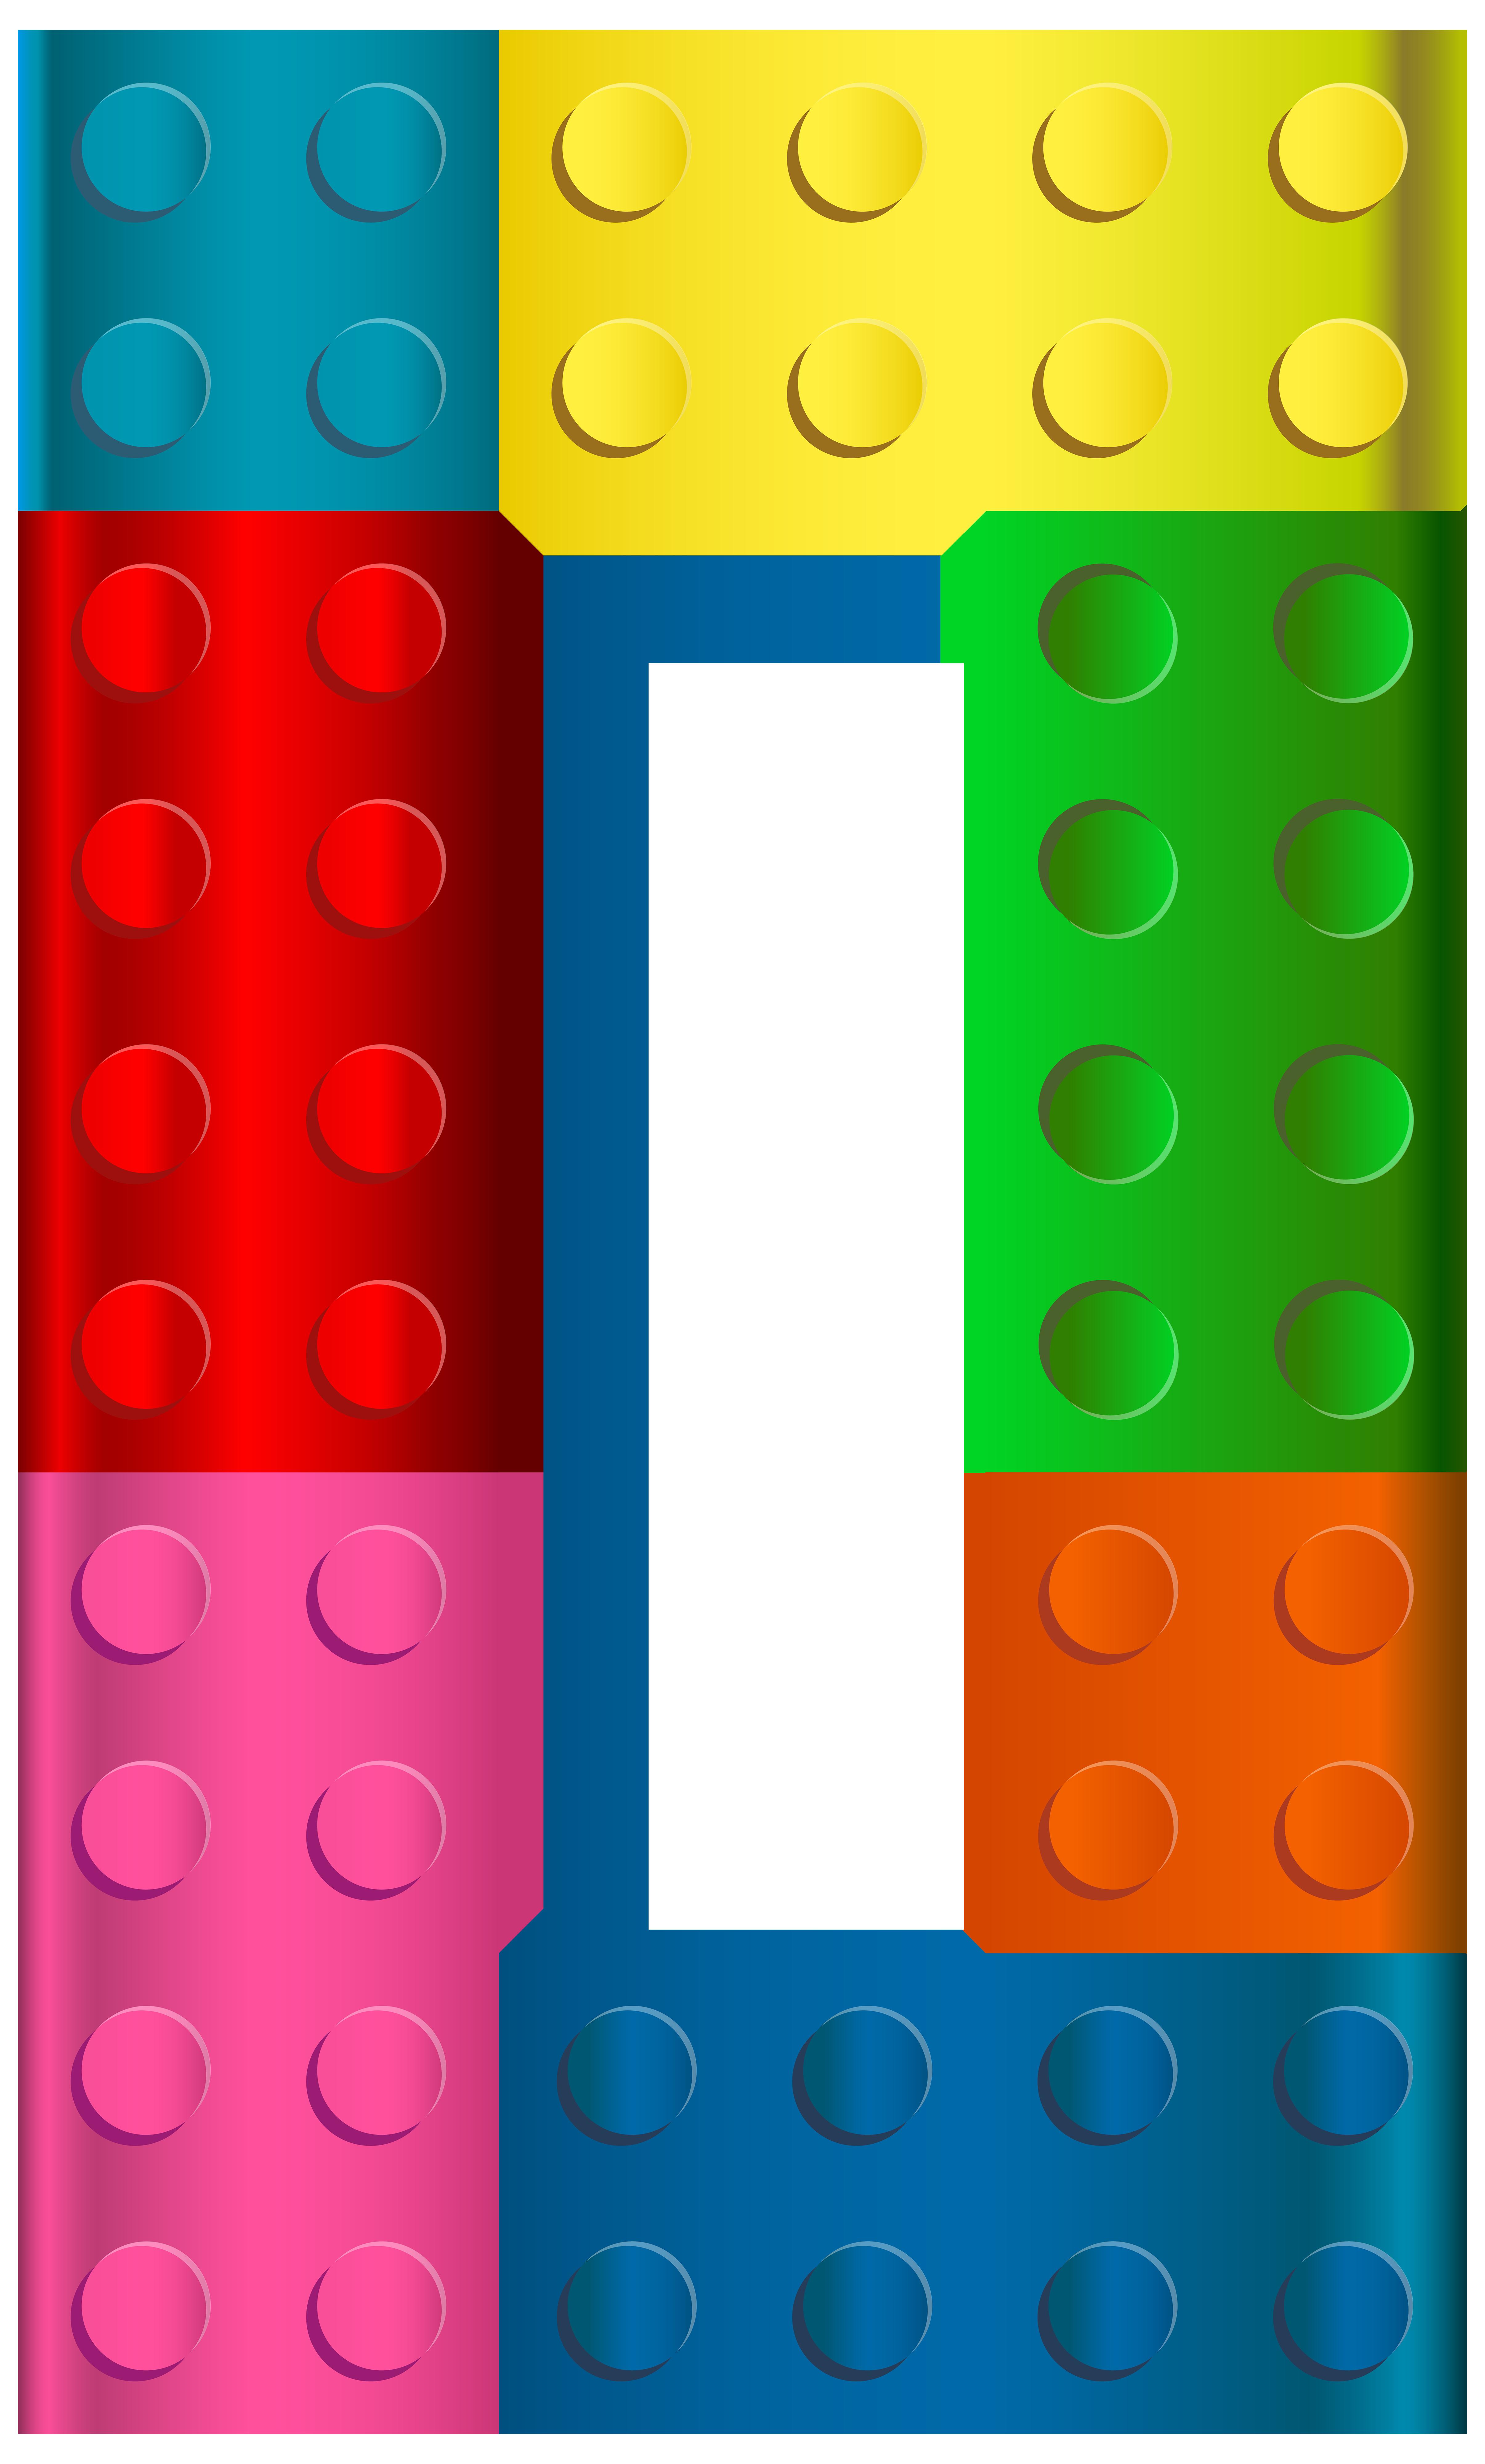 4822x8000 Lego Number Zero Png Transparent Clip Art Imageu200b Gallery